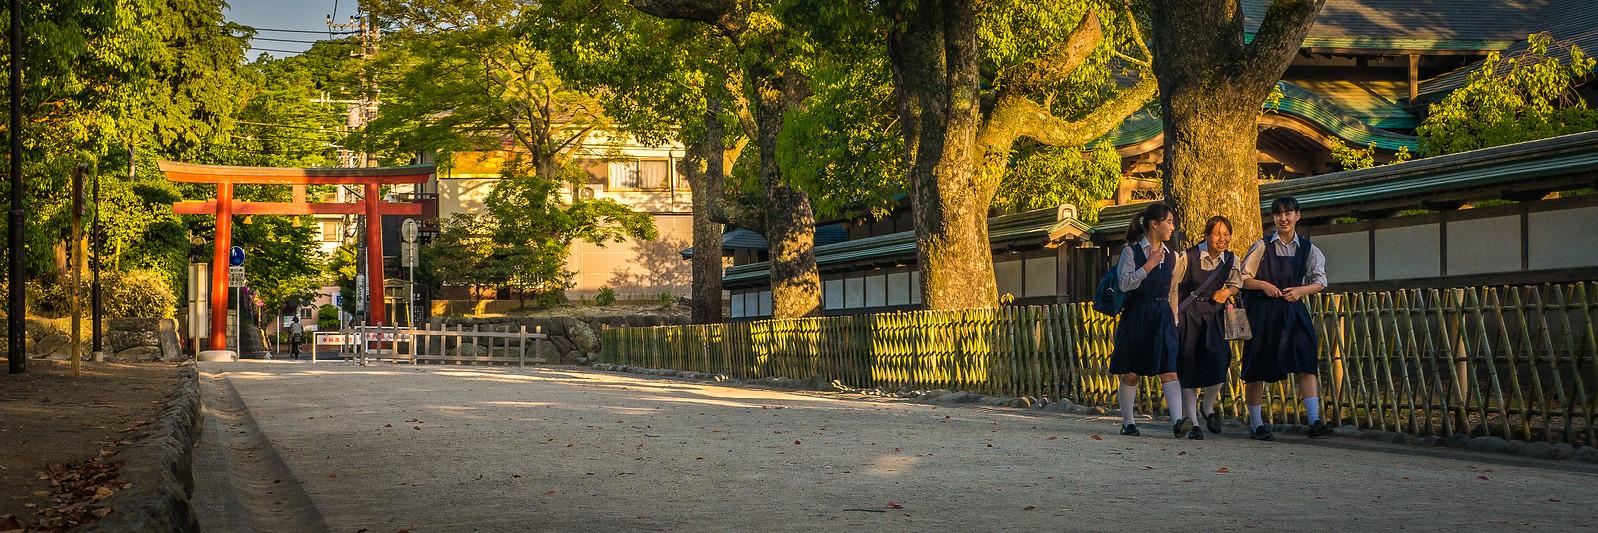 Tsurugaoka Hachiman-gū Temple